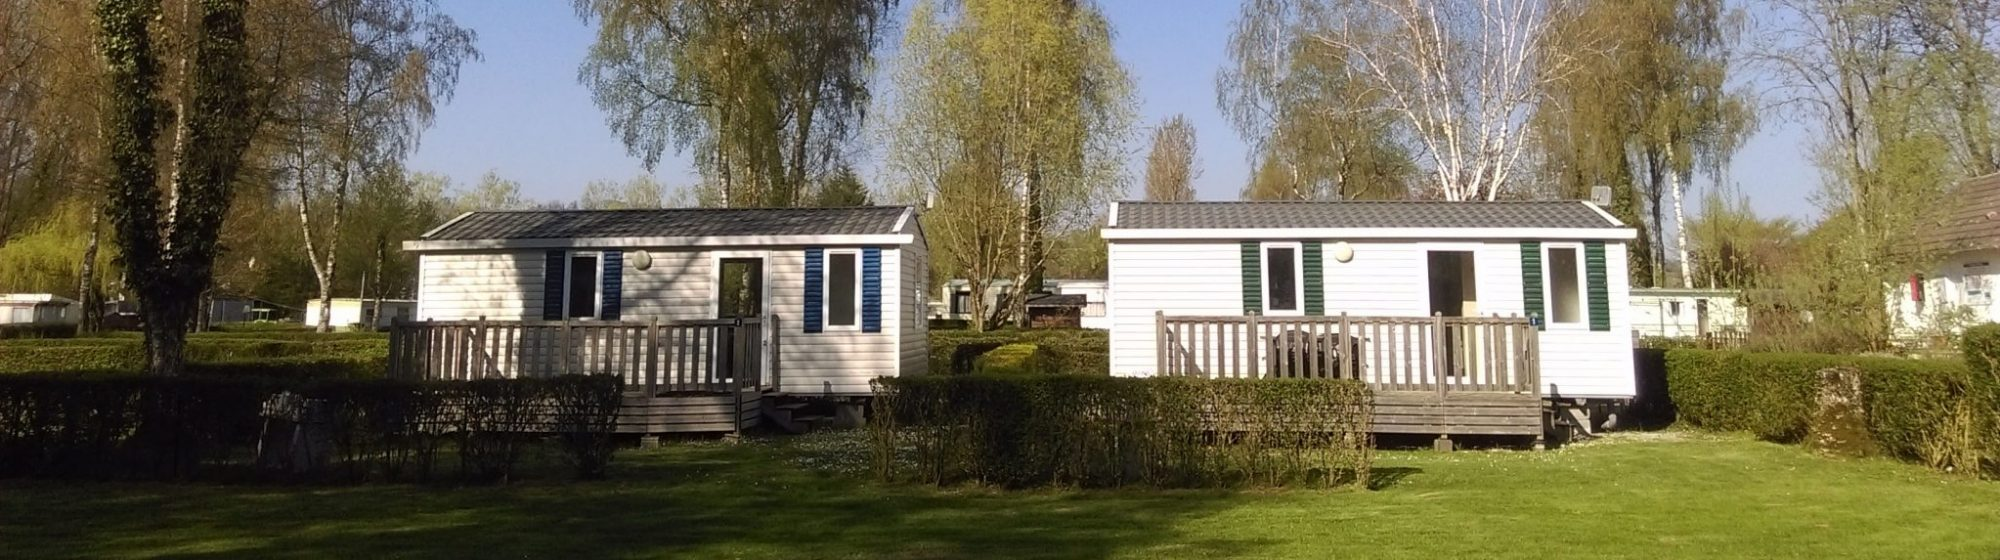 Mobil-home Camping Pas de Calais